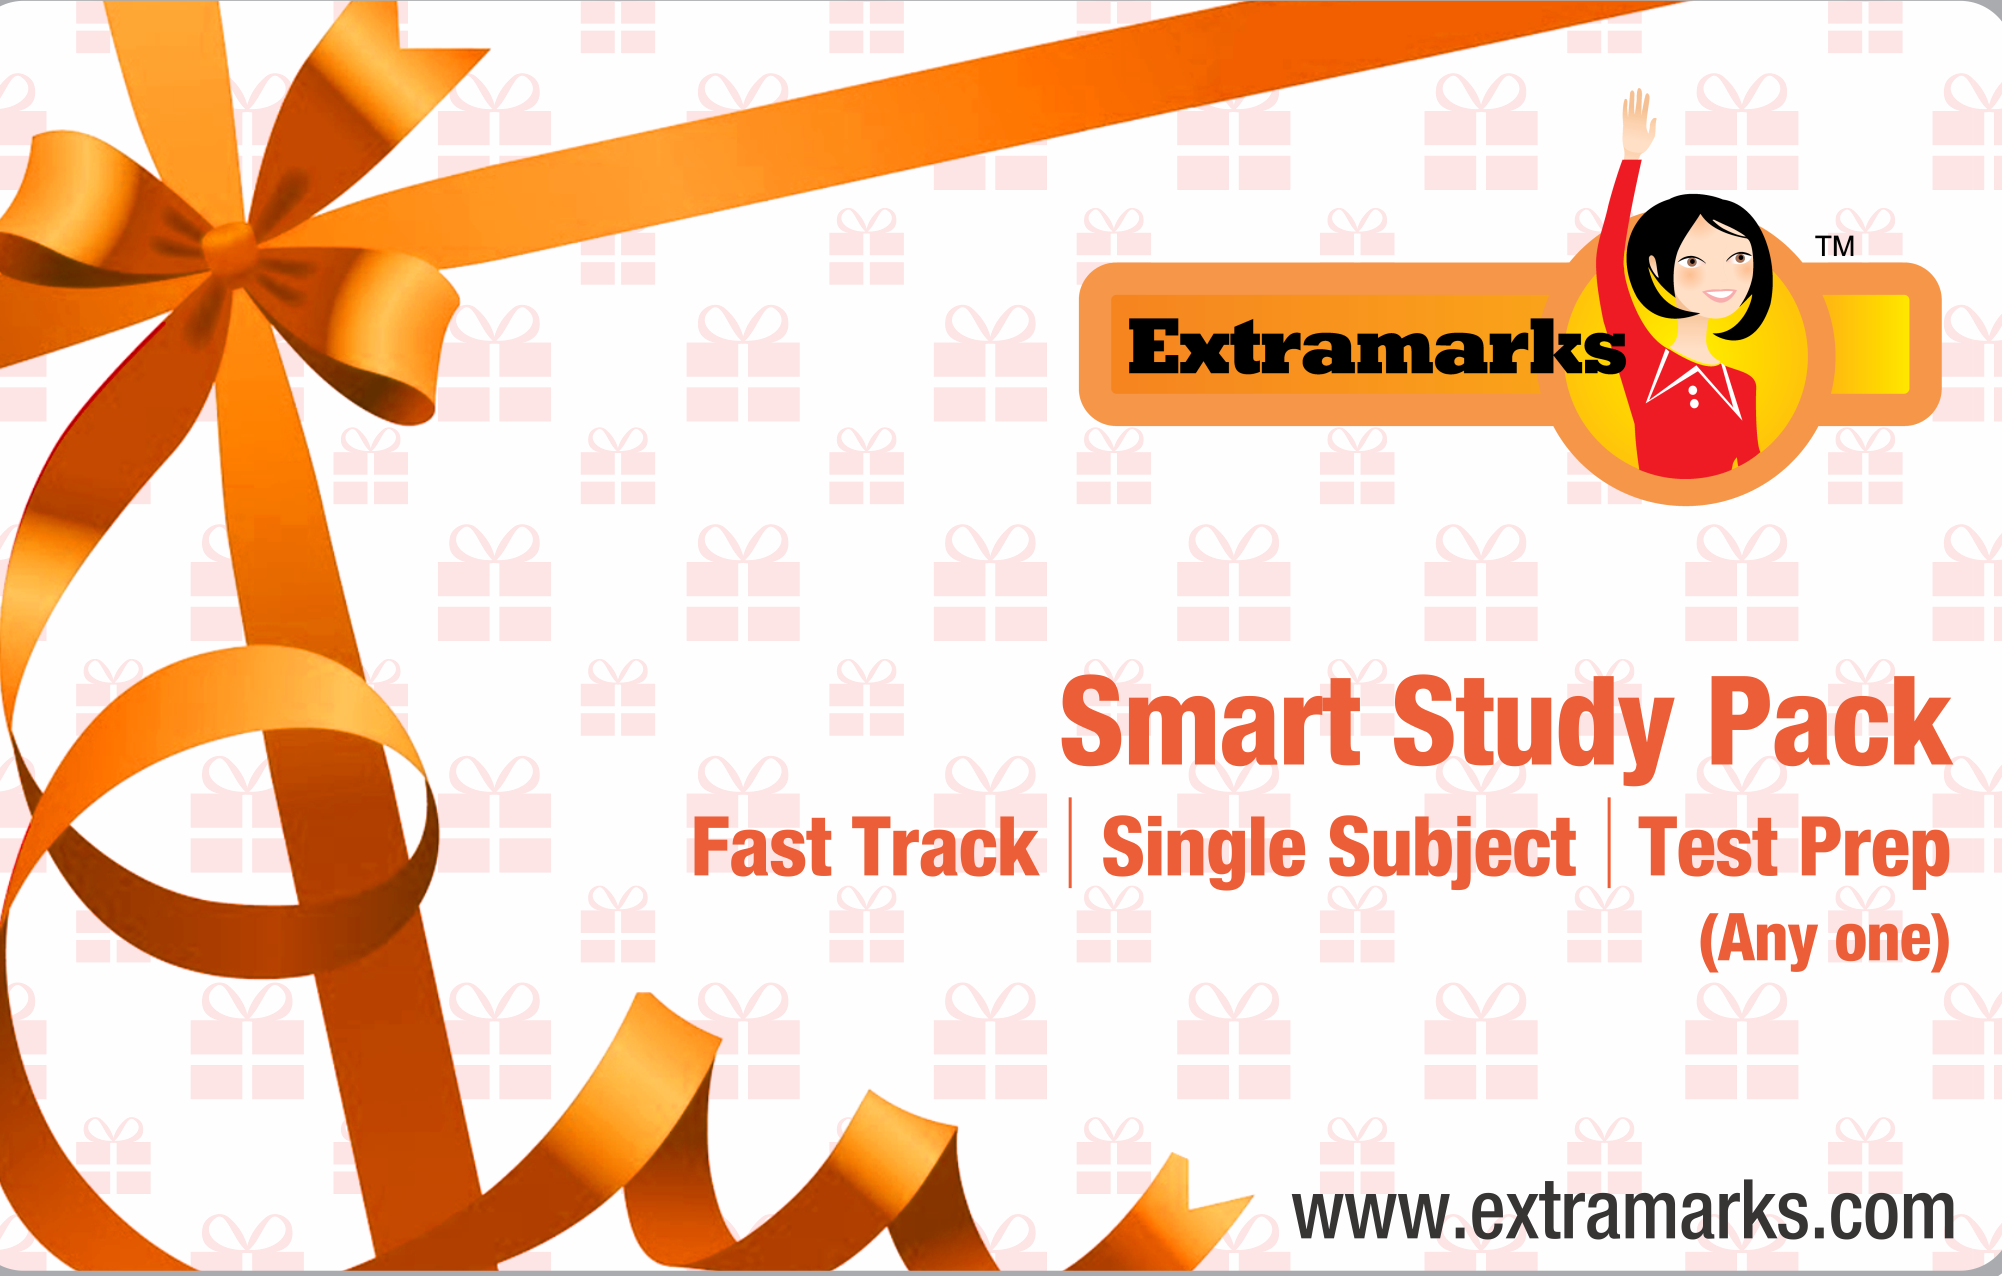 Extramarks Smart Study Pack for Class XI (CBSE)